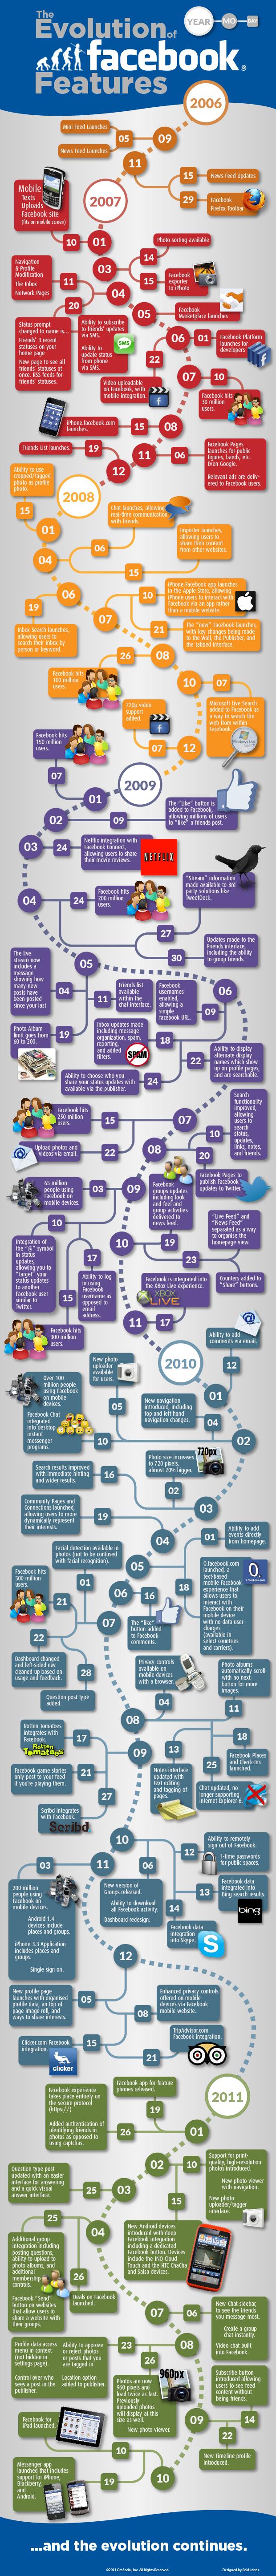 facebook-timeline-features